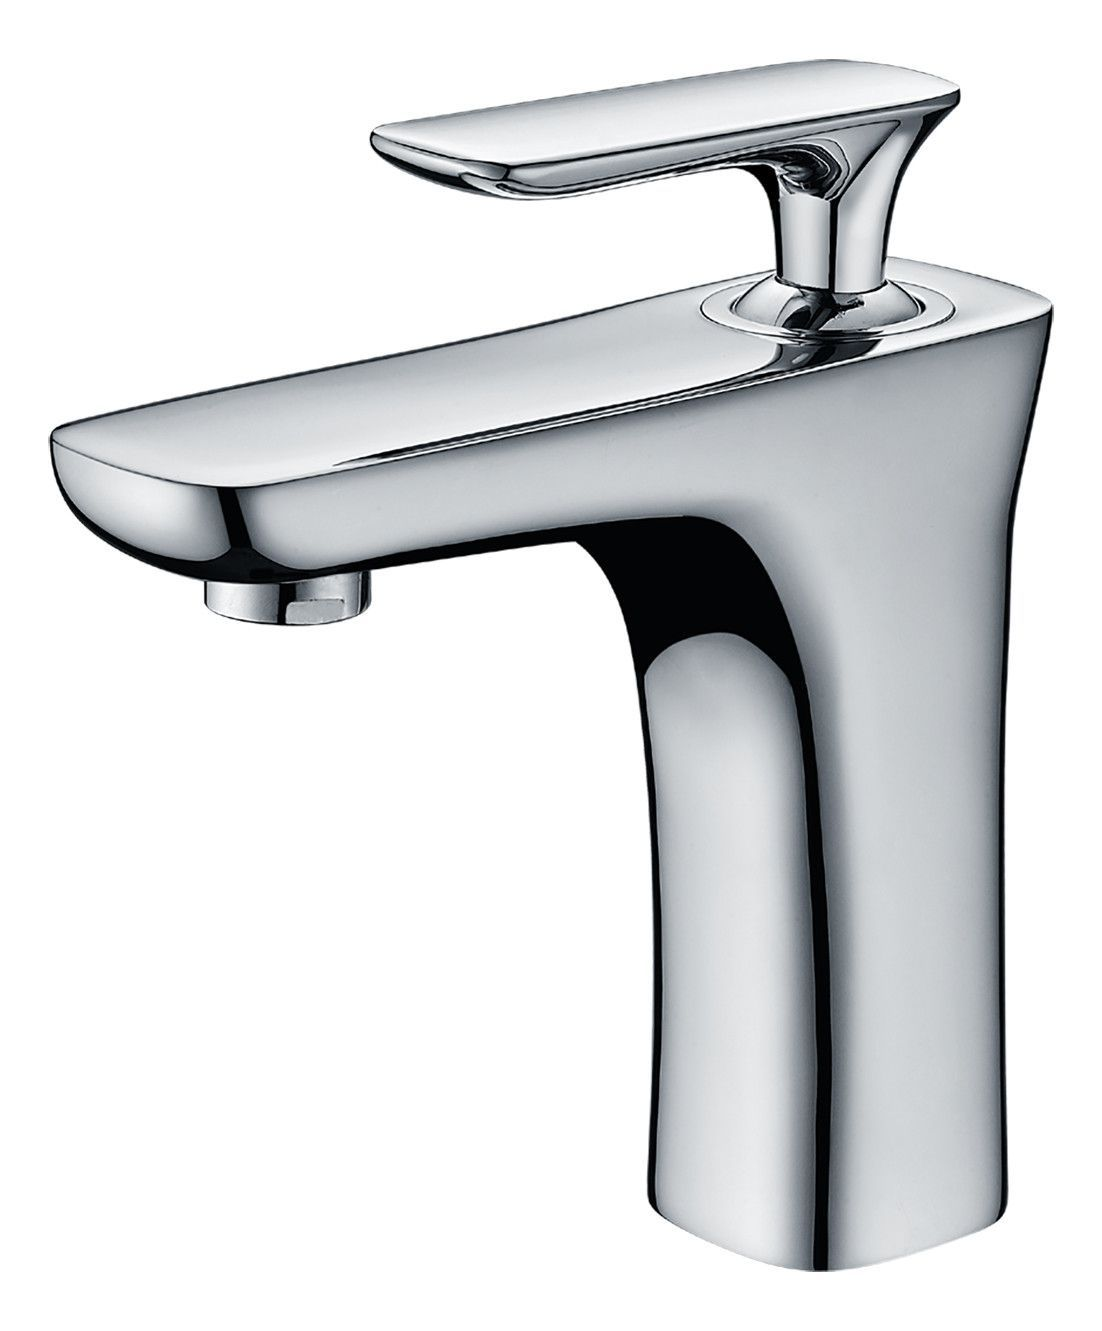 Single Hole Brass Faucet | Wall mounted bathroom sinks ...